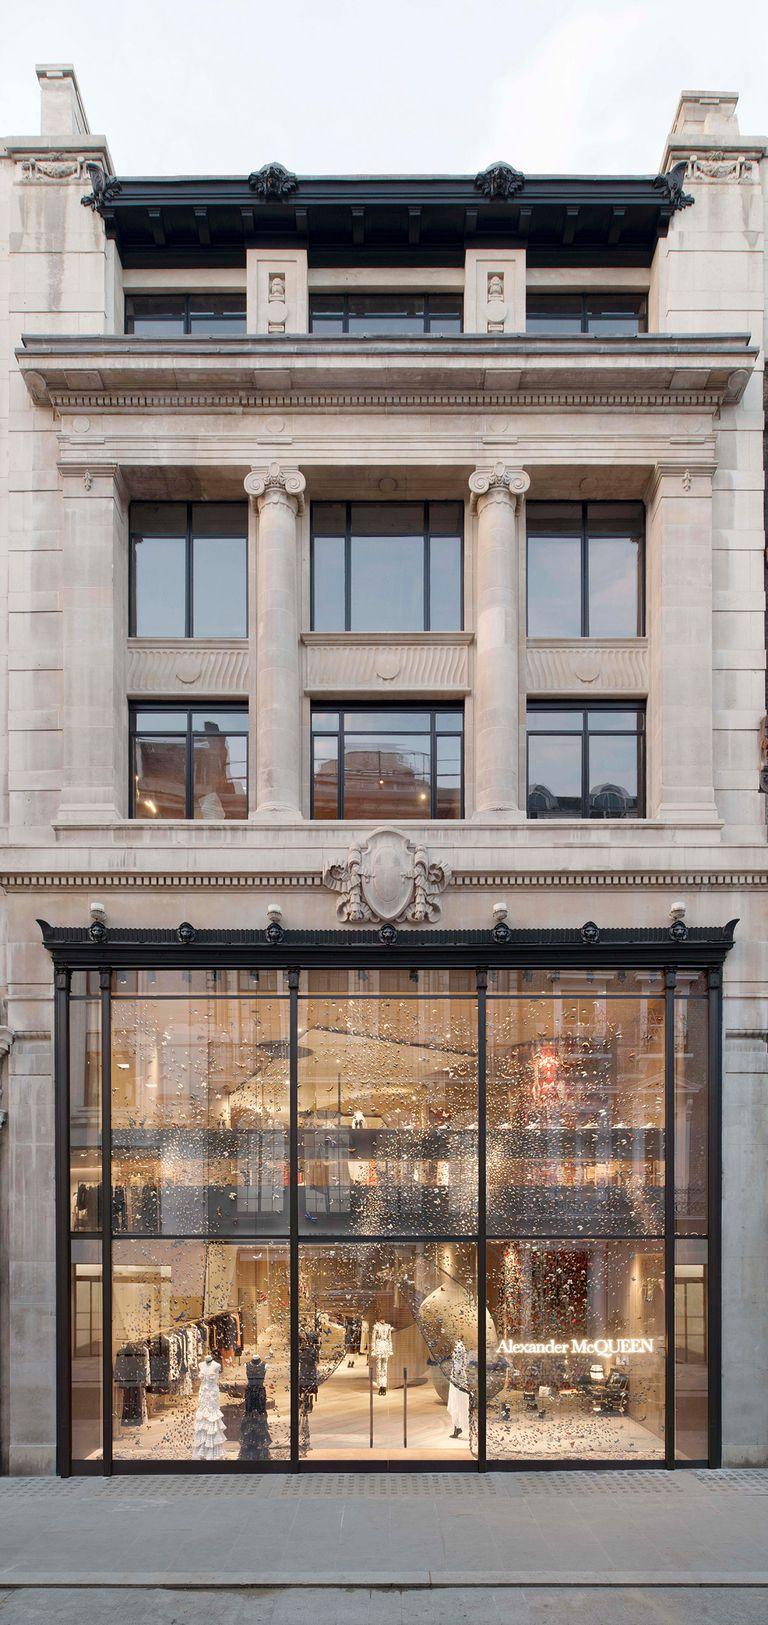 Alexander McQueen, Bond Street, Mayfair, London -  credit: Elle